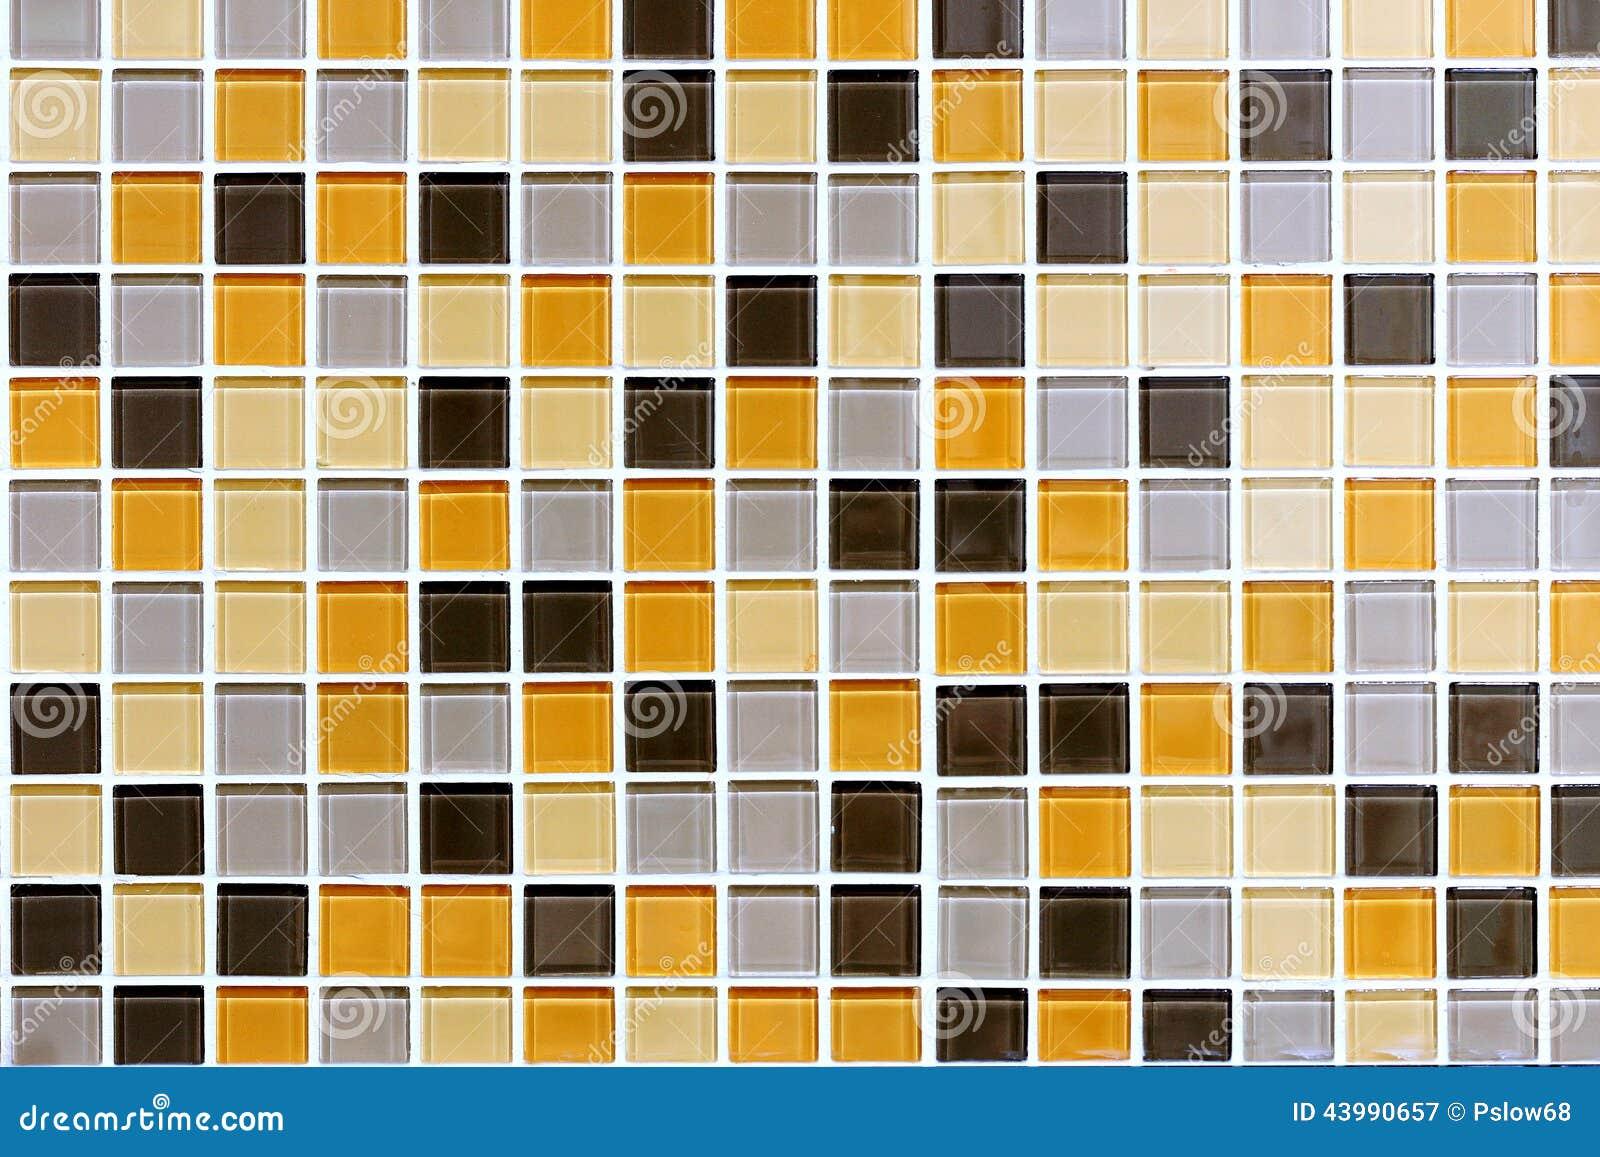 Coloured Tiles Wall stock image  Image of orange, grey - 43990657